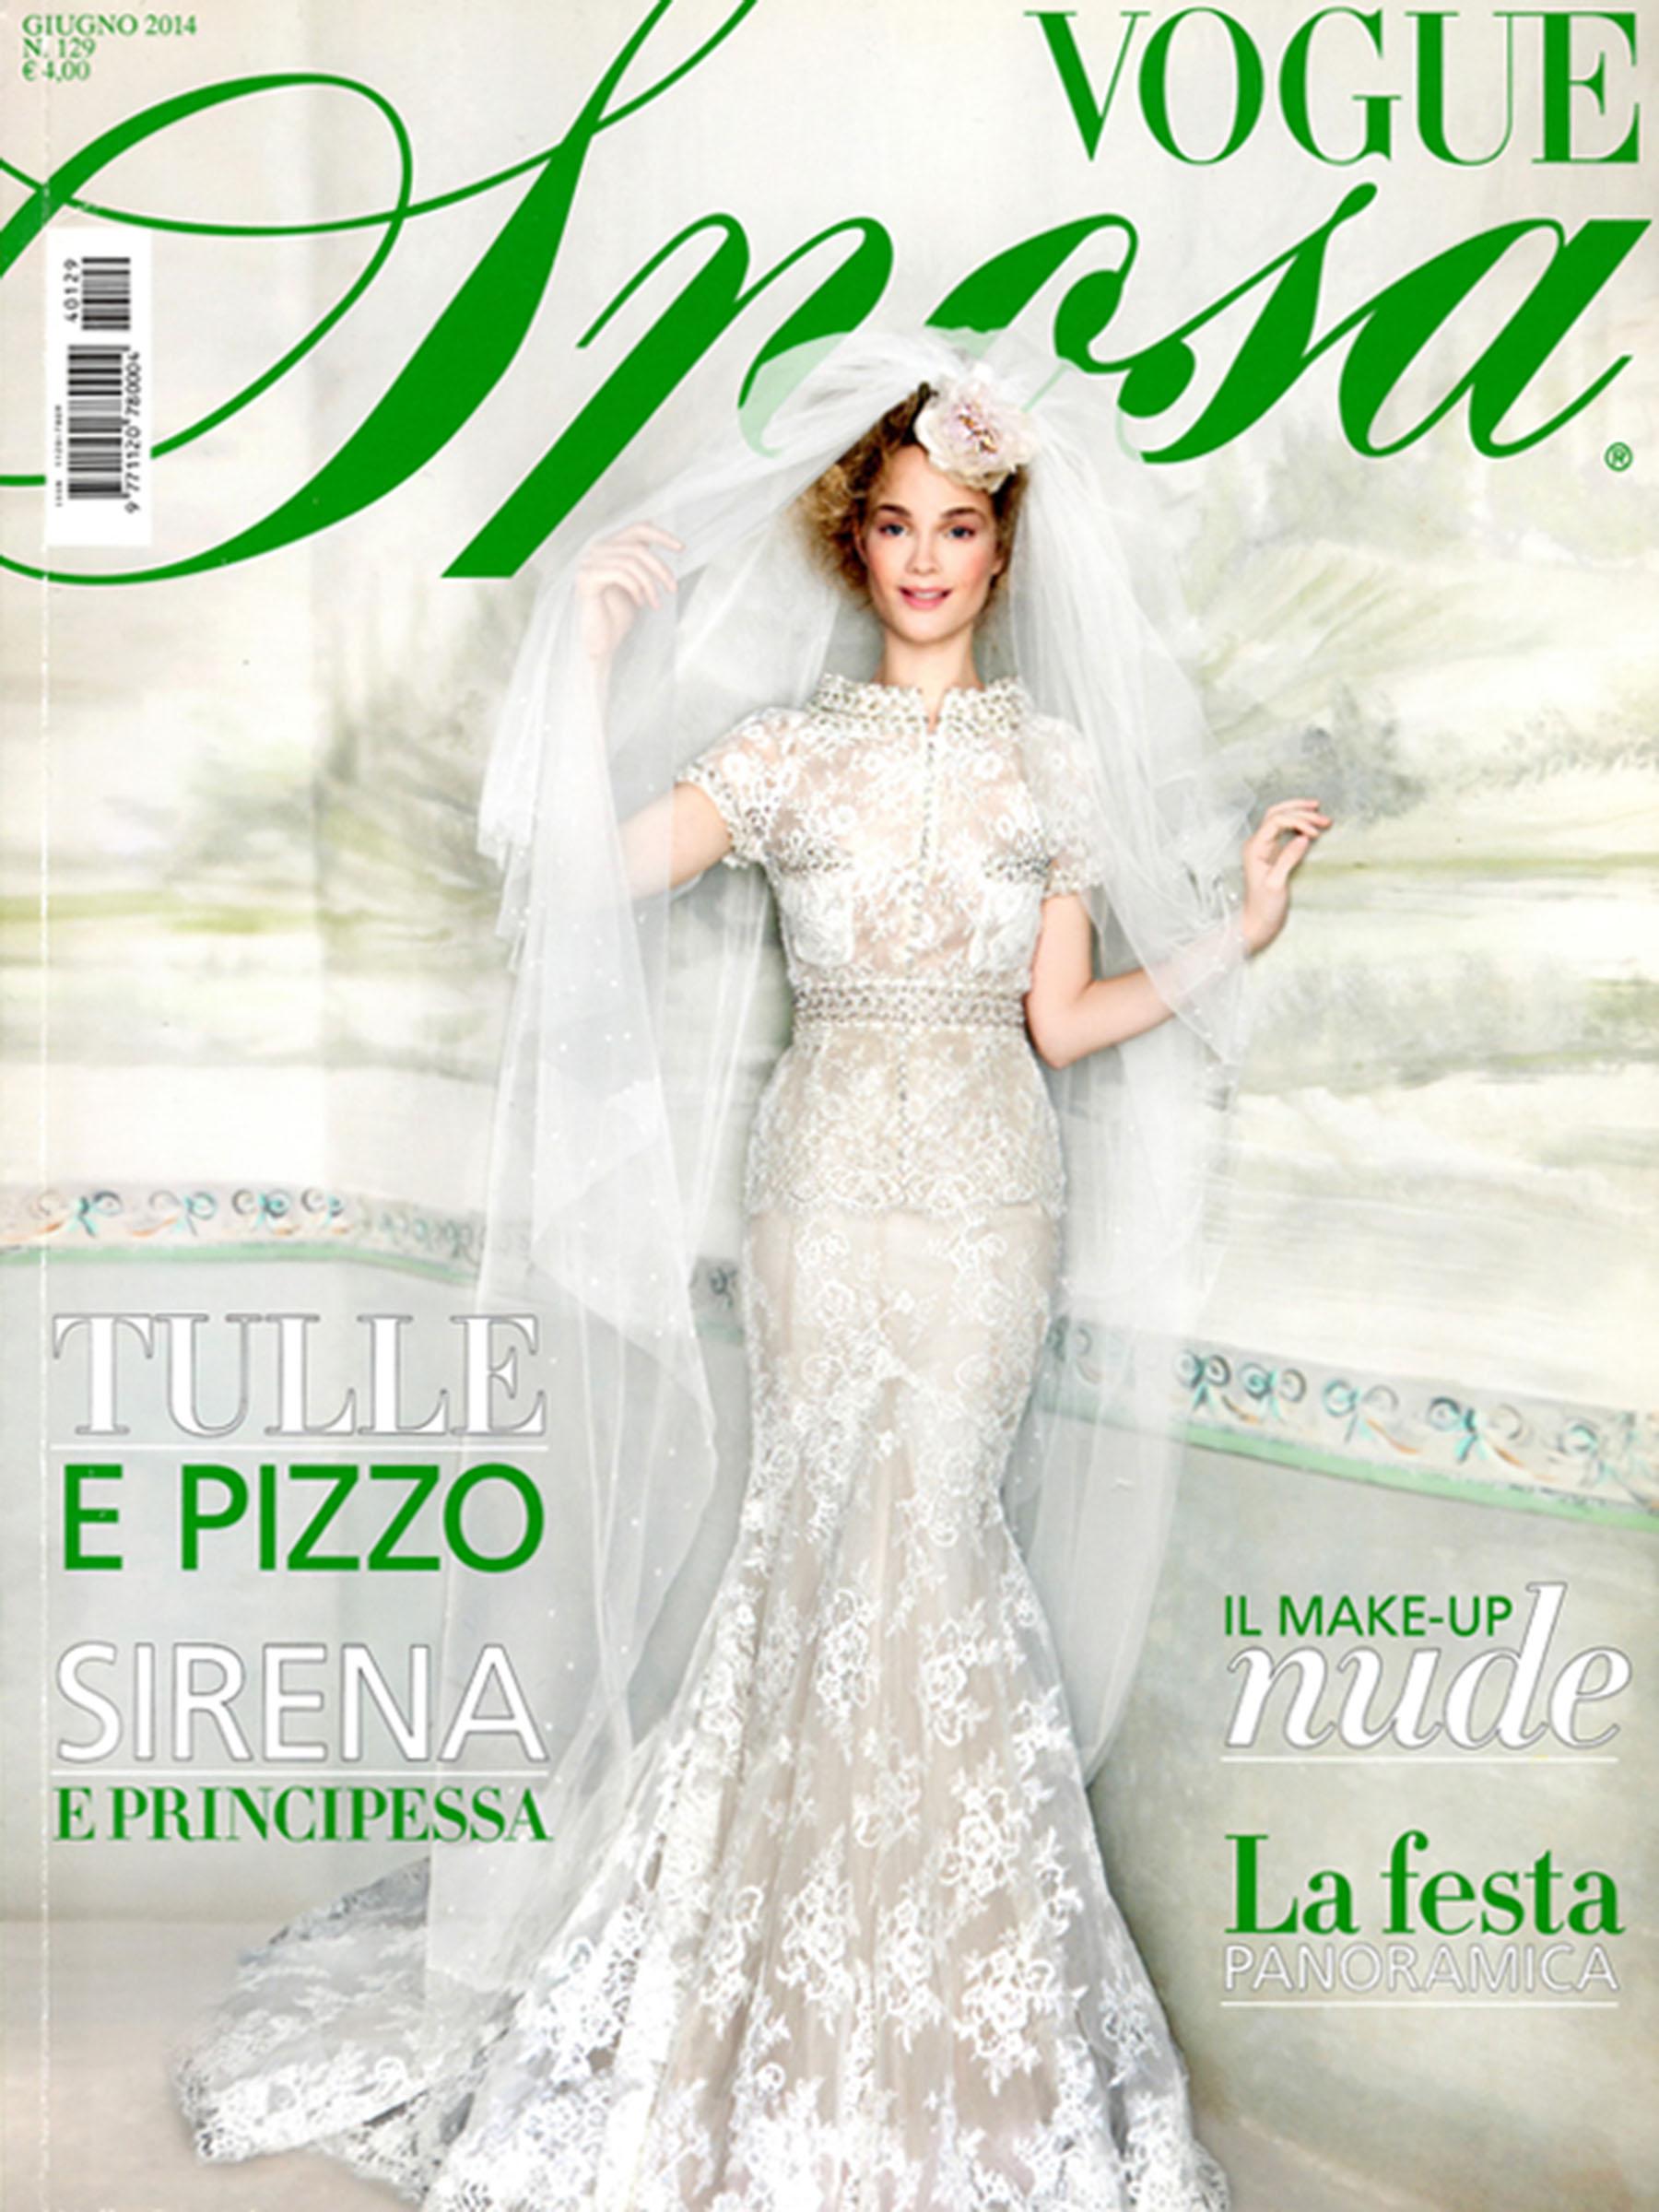 Vogue Sposa 2 low.jpg